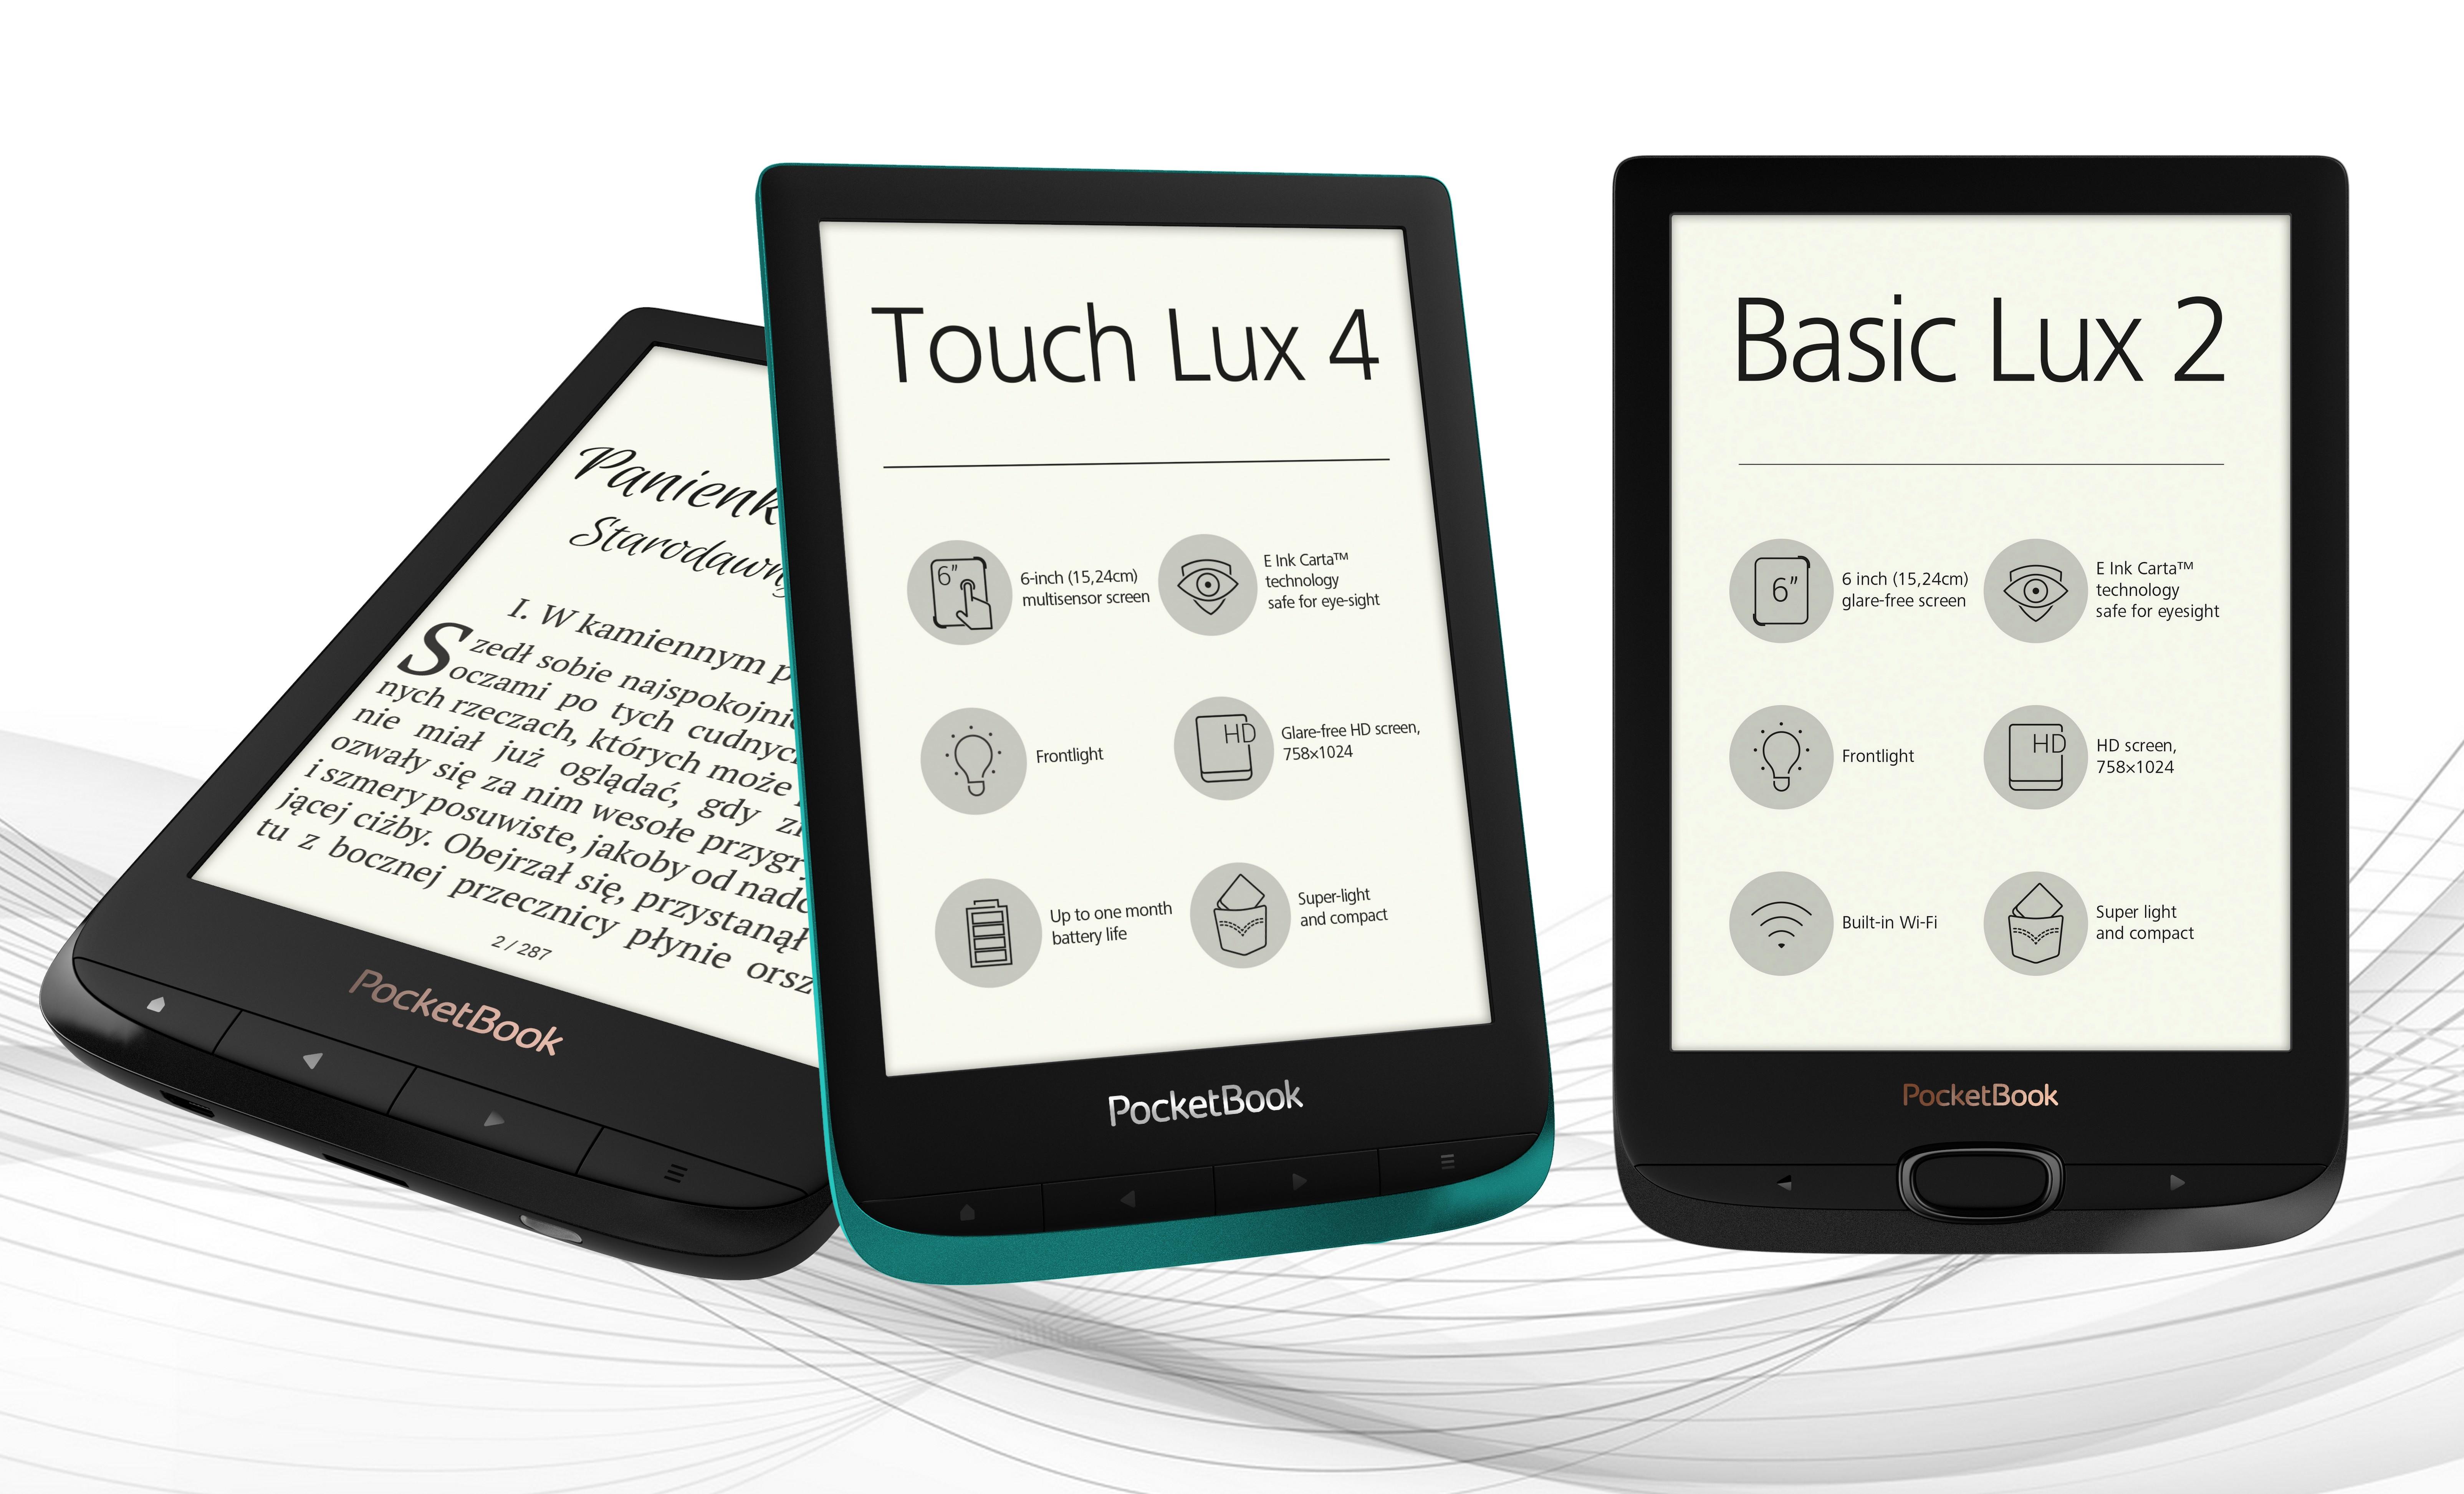 pocketbook basic lux 4 basic lux 2